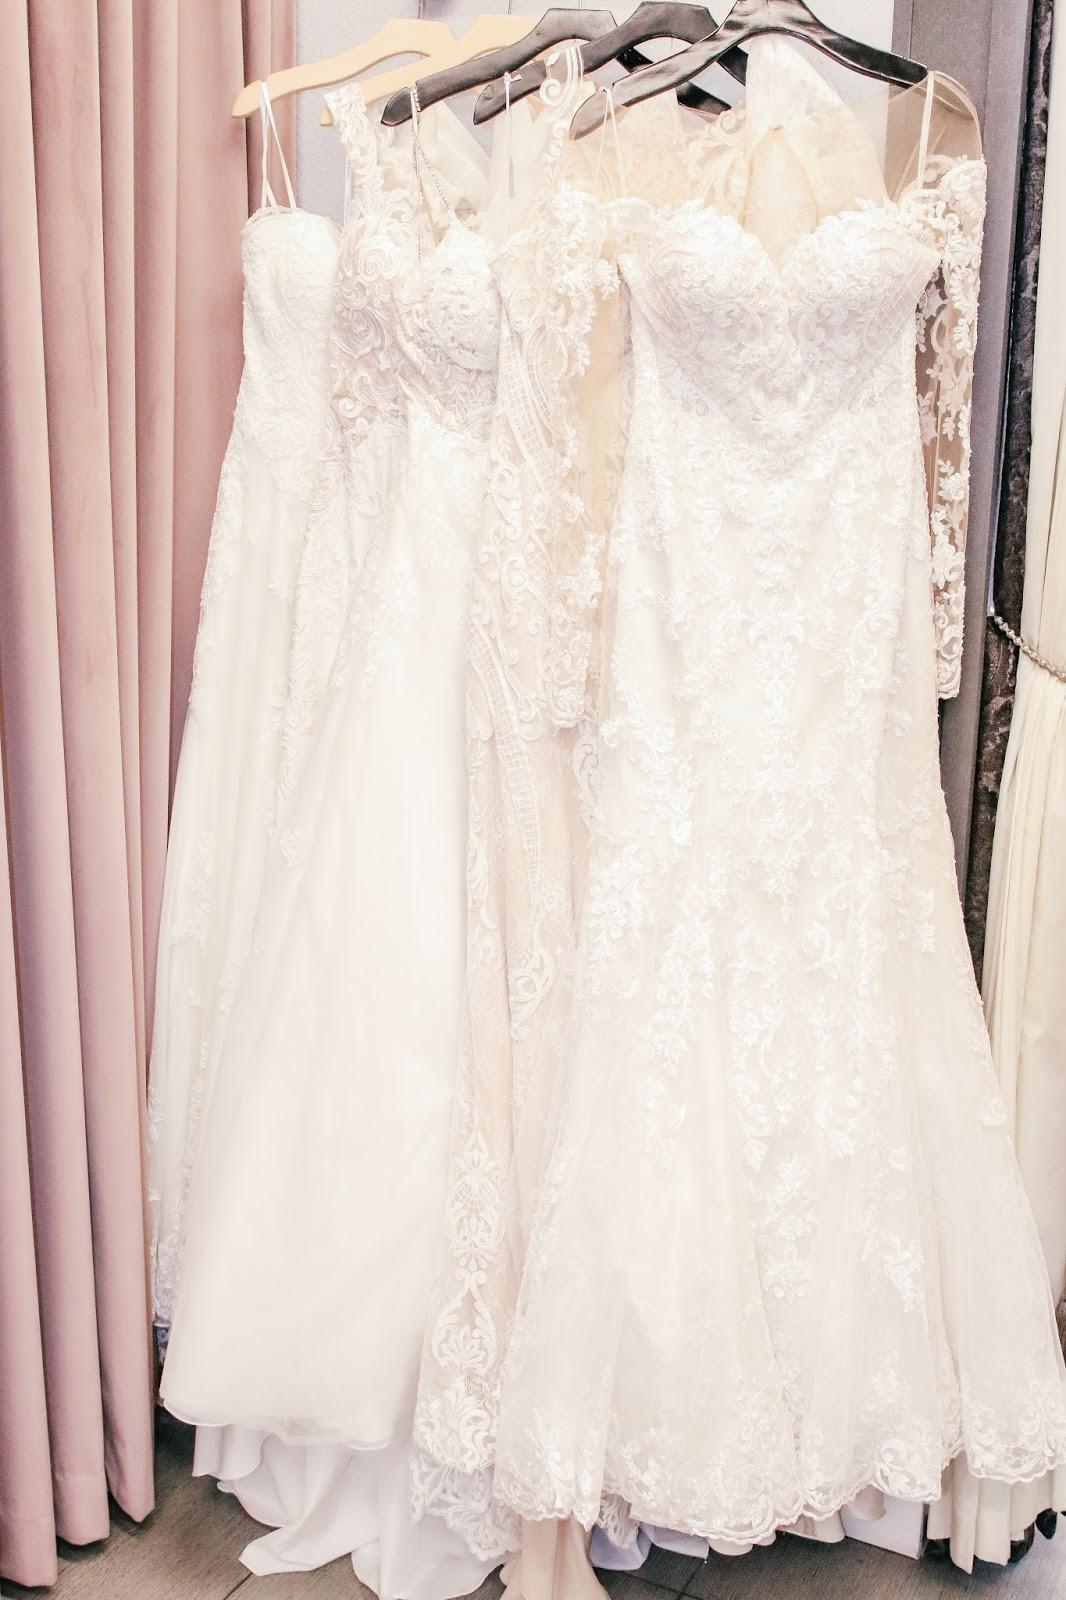 Wedding Dress Shopping | STYLE WEEKENDER